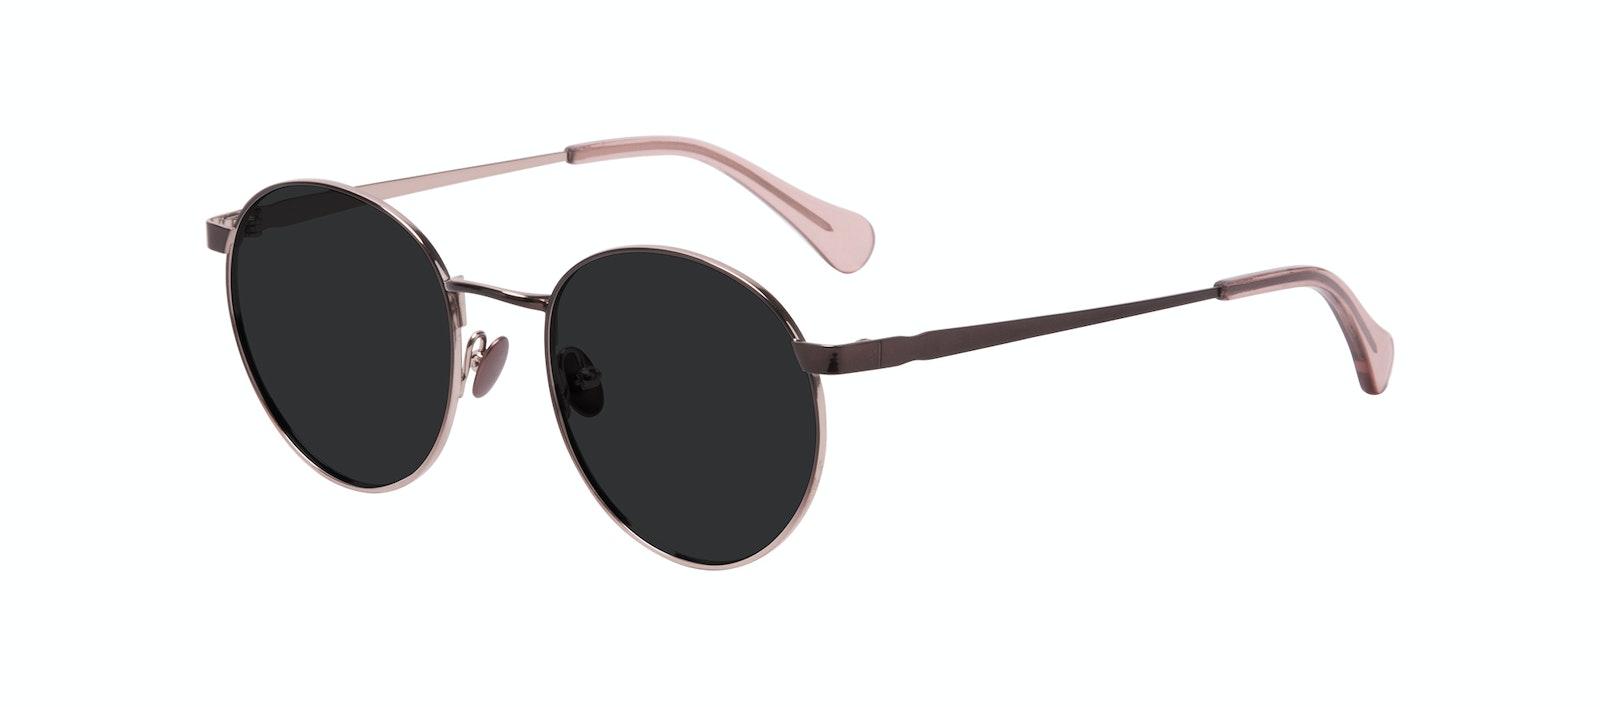 Affordable Fashion Glasses Round Sunglasses Women Foundry Pink Terra Tilt